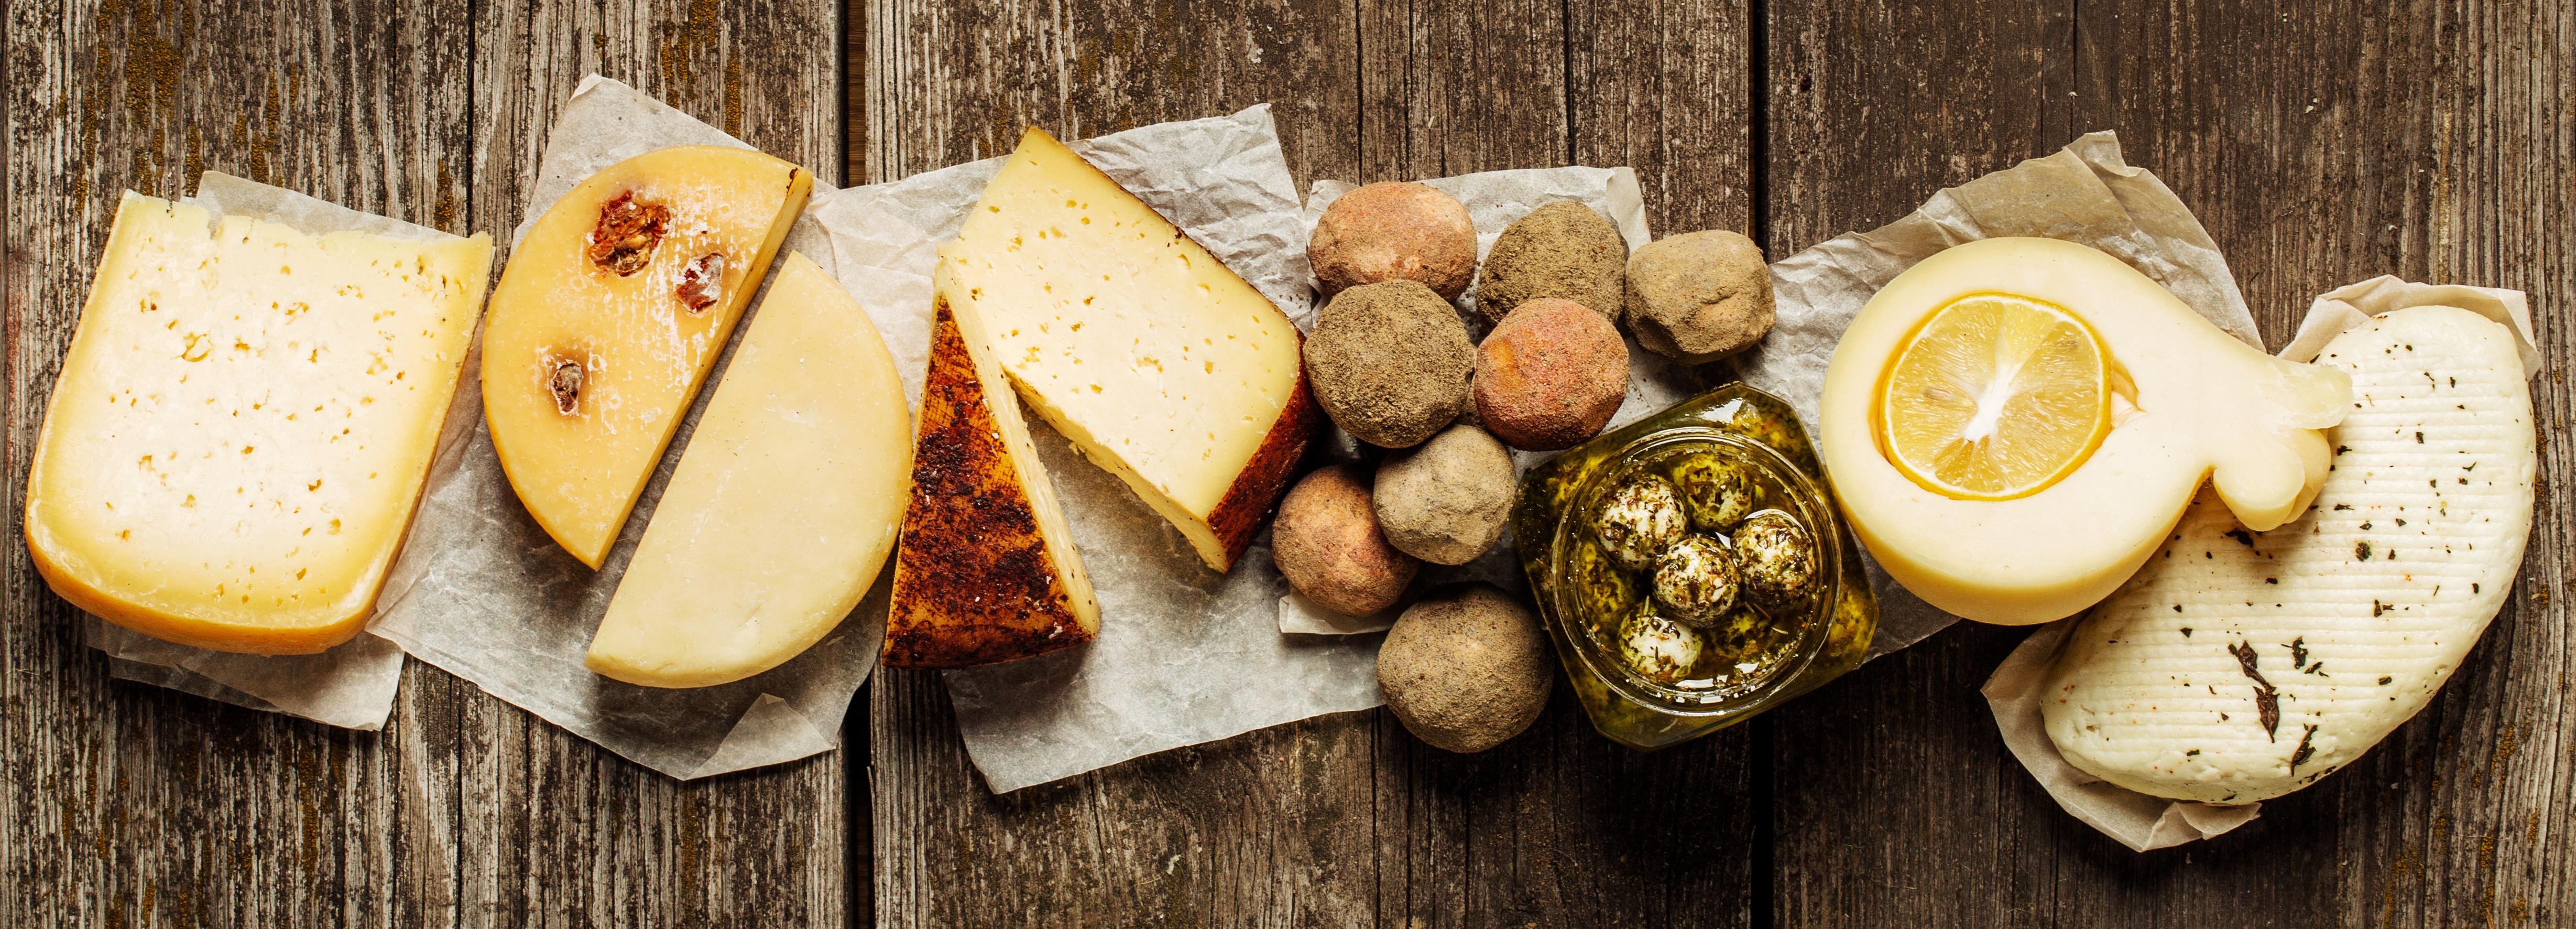 Adobestock cheesespread